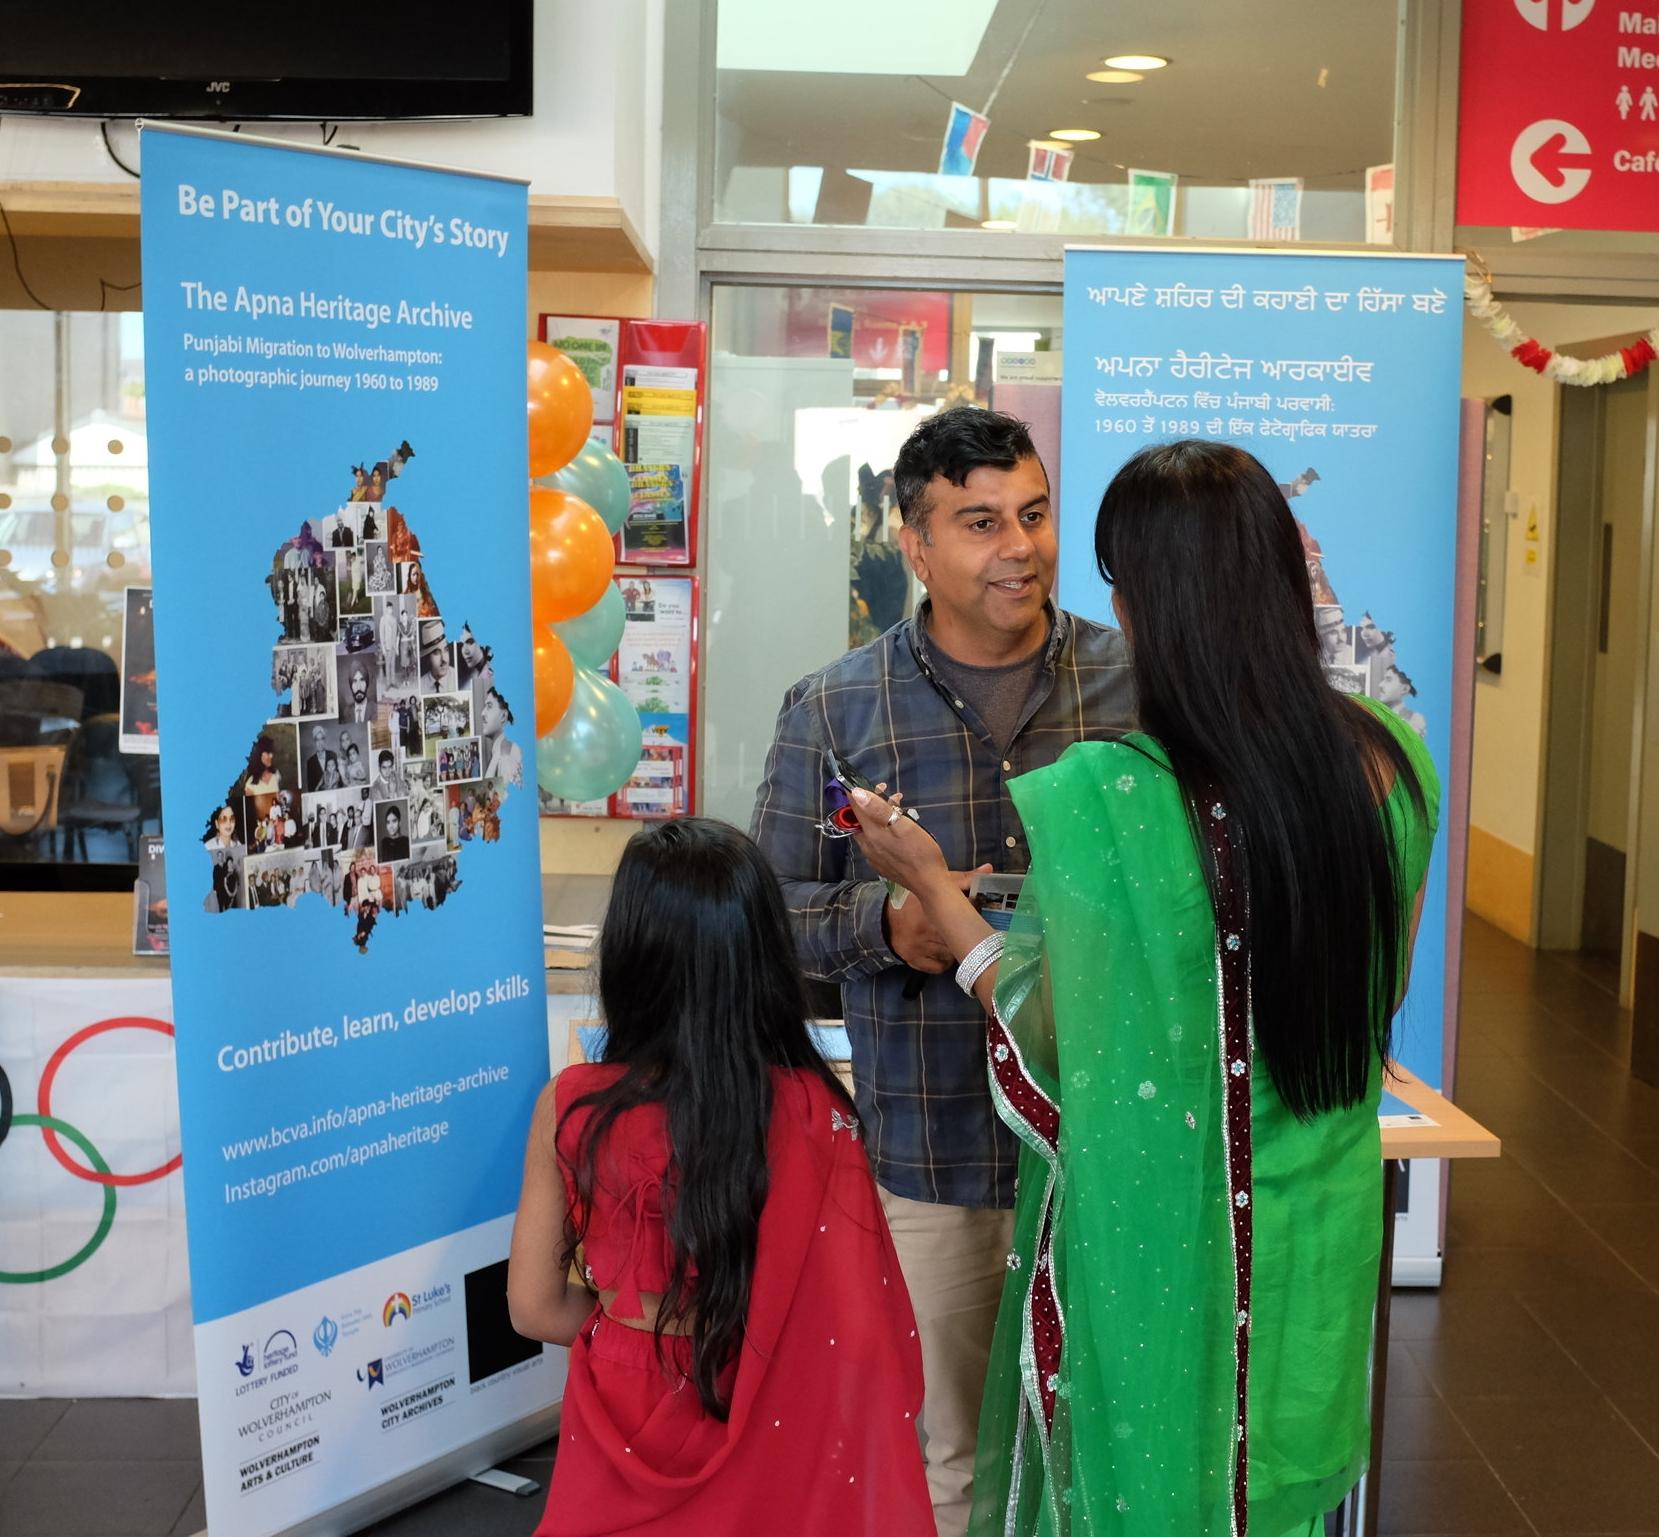 Anand talking to Tiranga visitors